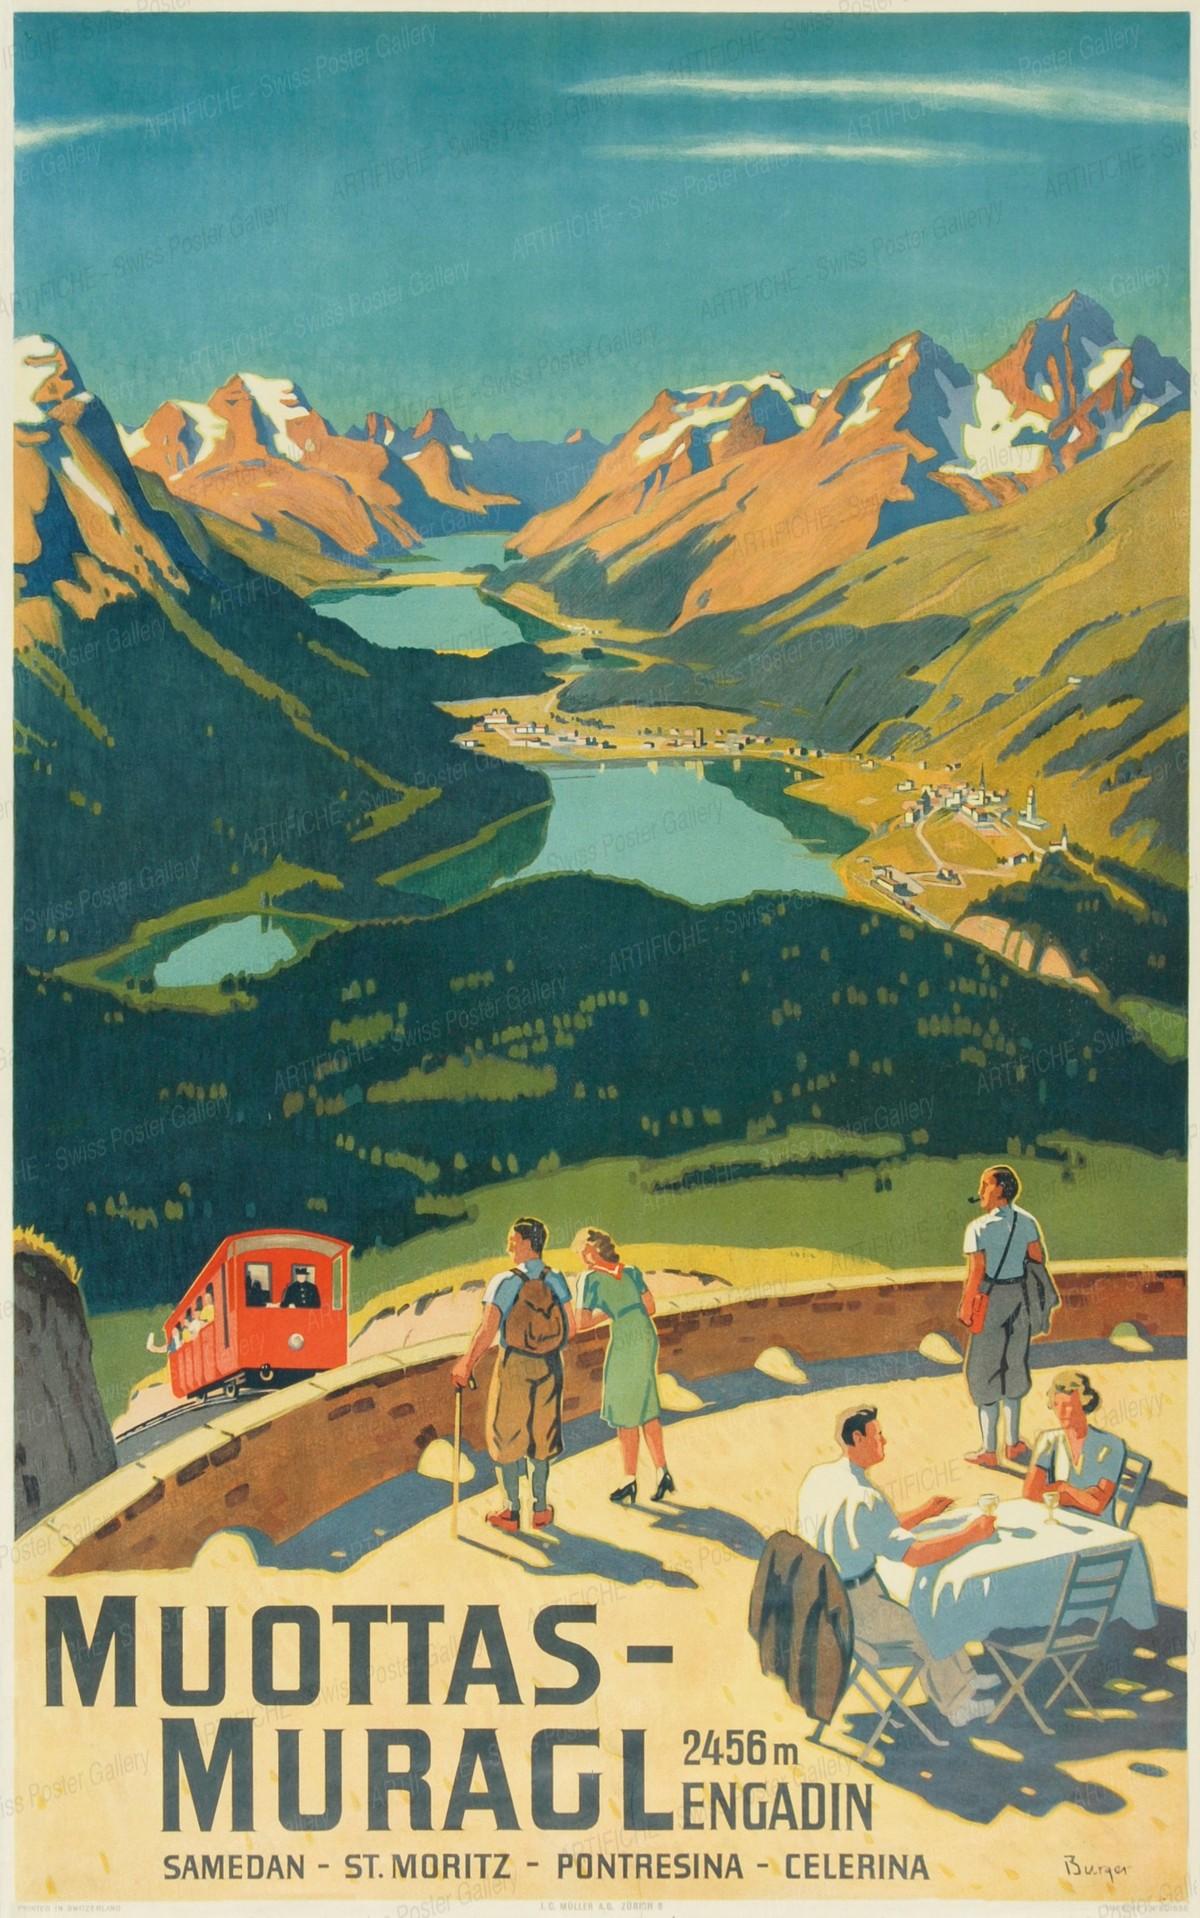 Muottas-Muragl 2456 m. Engadin Samedan – St. Moritz -Pontresina – Celerina, Wilhelm Friedrich Burger